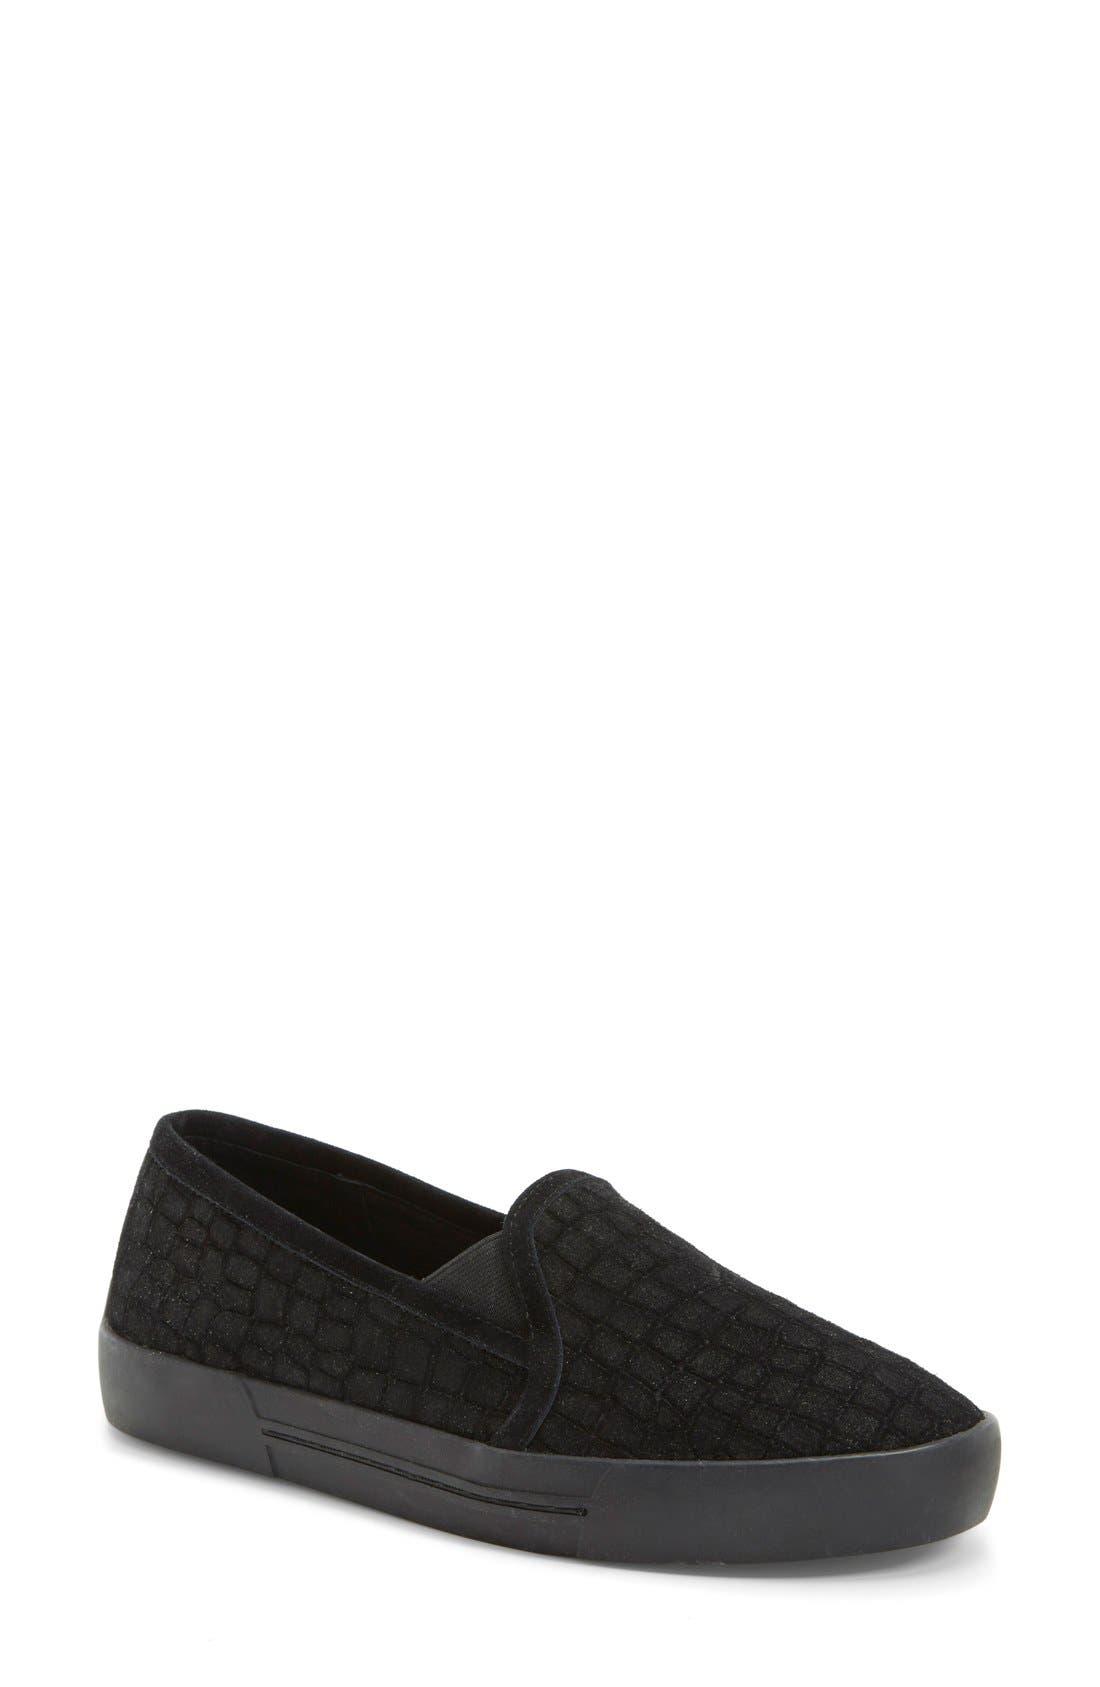 JOIE, 'Huxley' Slip-On Sneaker, Main thumbnail 1, color, 001